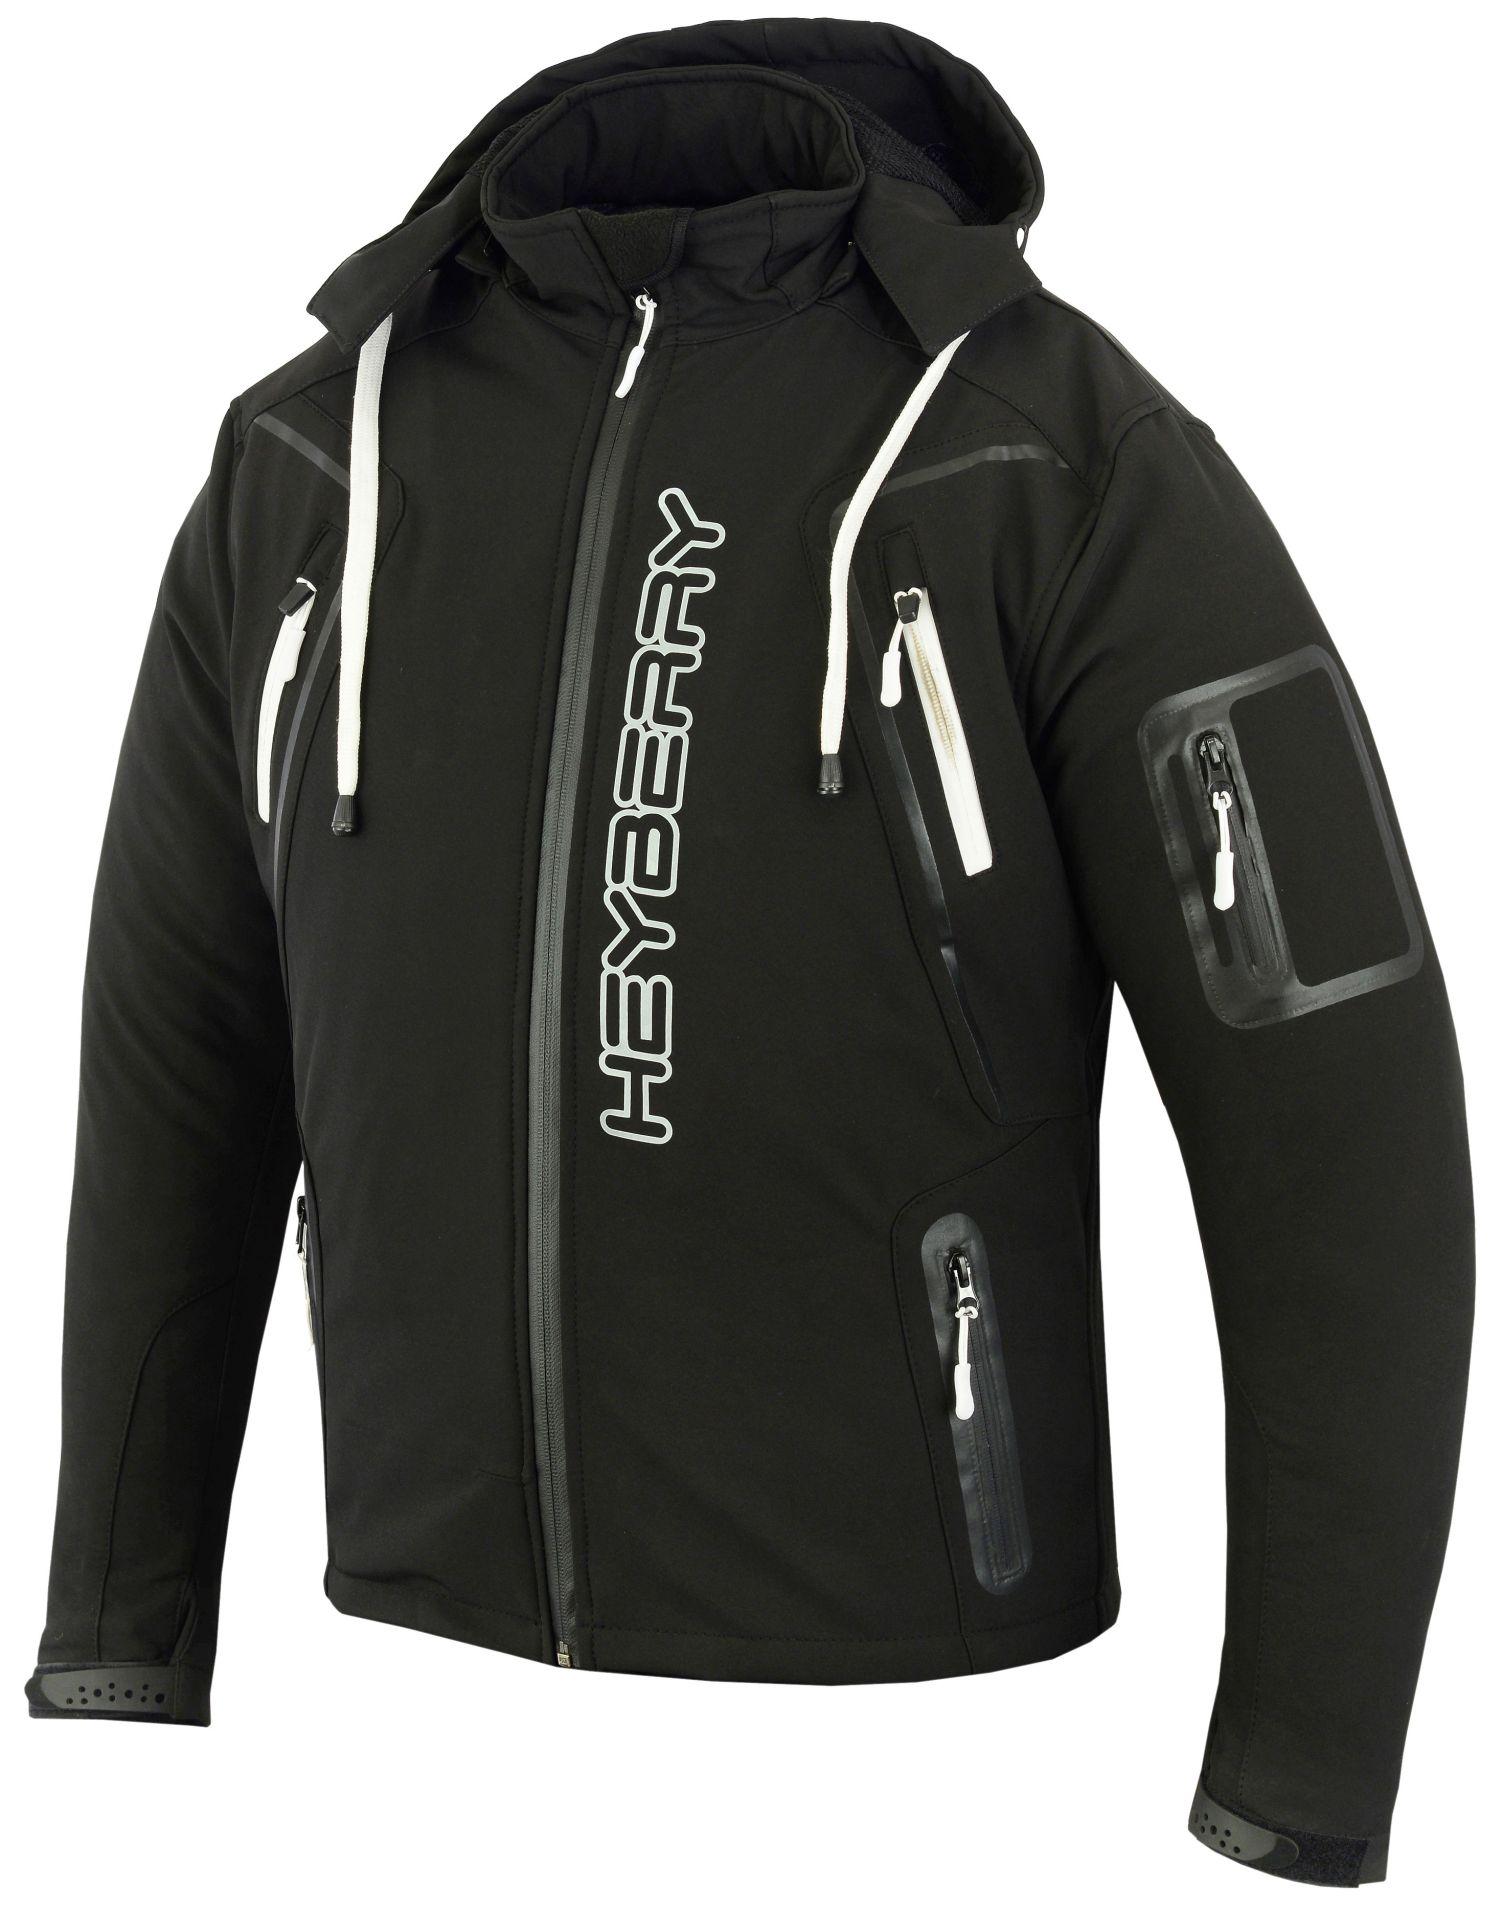 Soft Shell Motorradjacke Heyberry Textil Schwarz/Weiß Gr. M L XL XXL 3XL